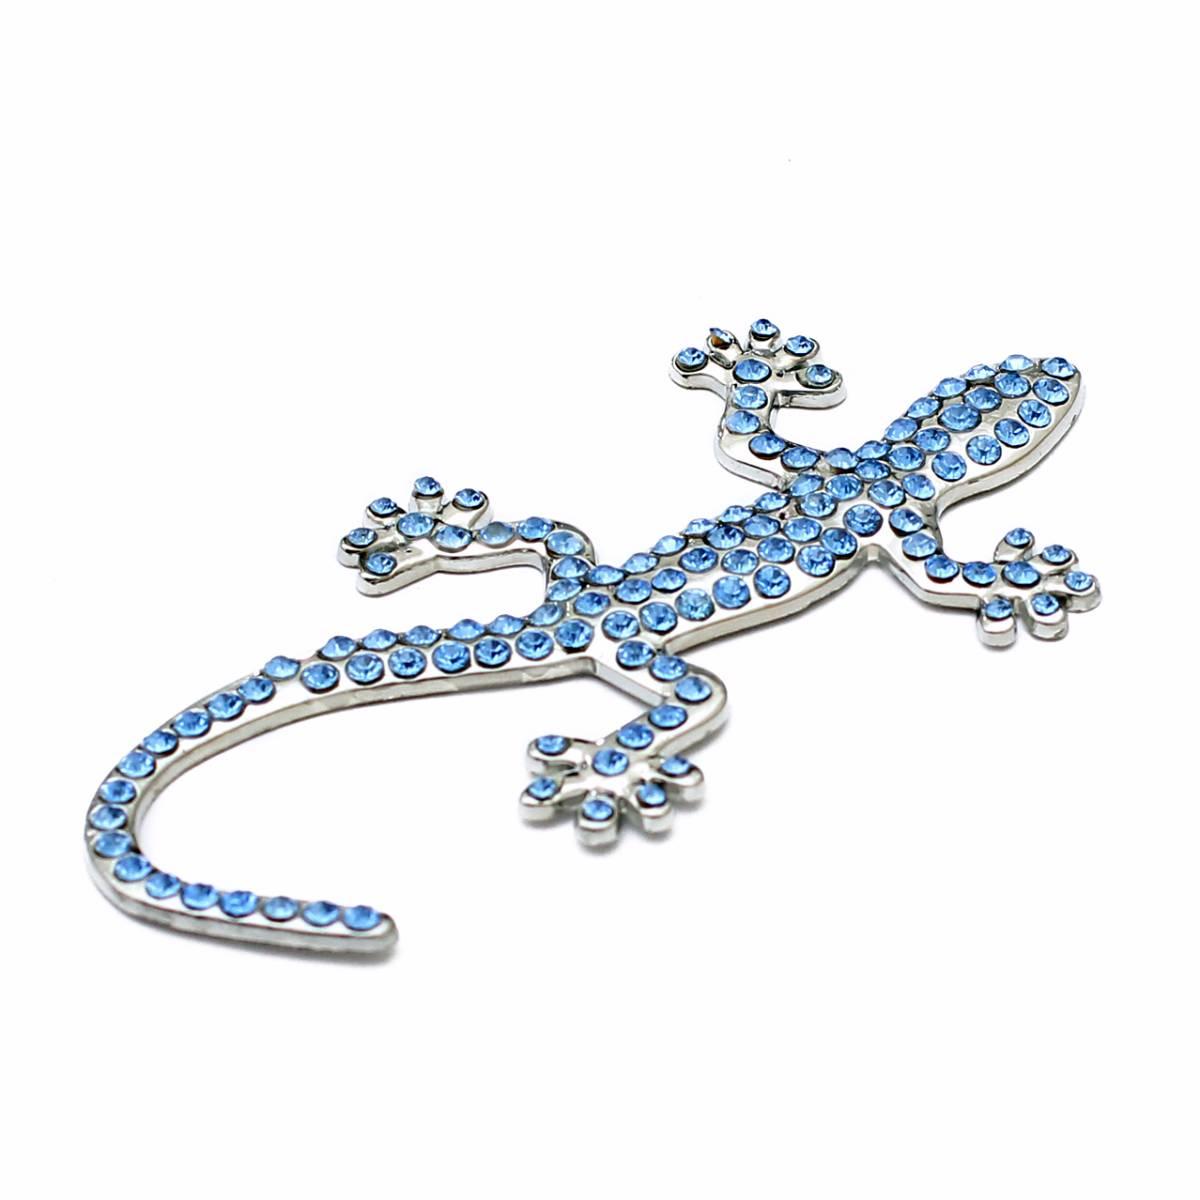 Emblem Variasi Gecko - Blue